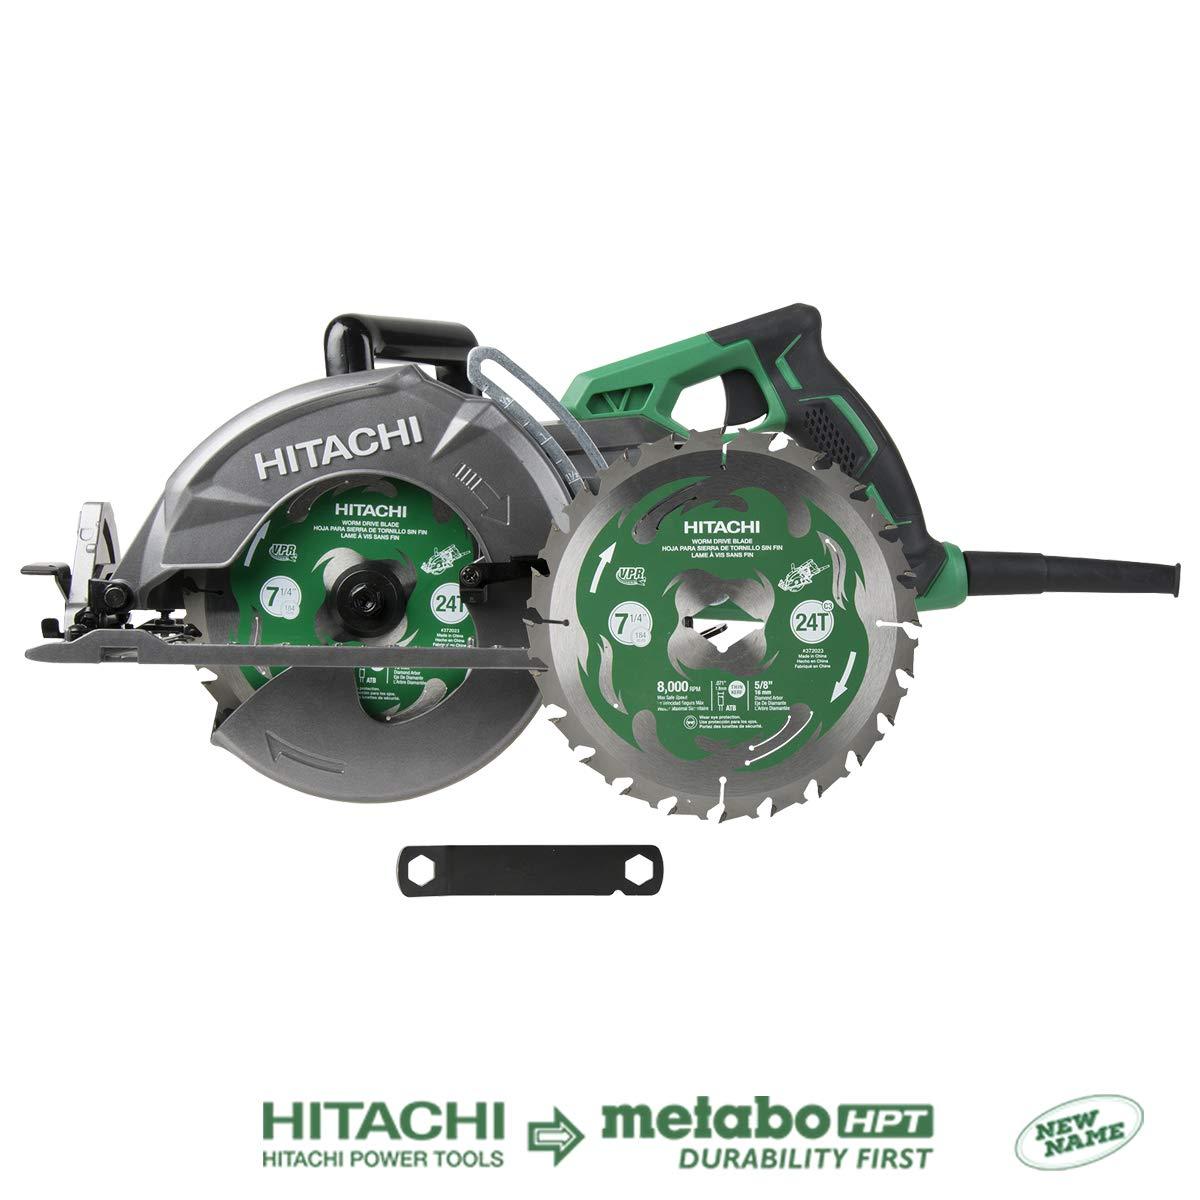 8. Hitachi C7WDM Worm Drive Circular Saw